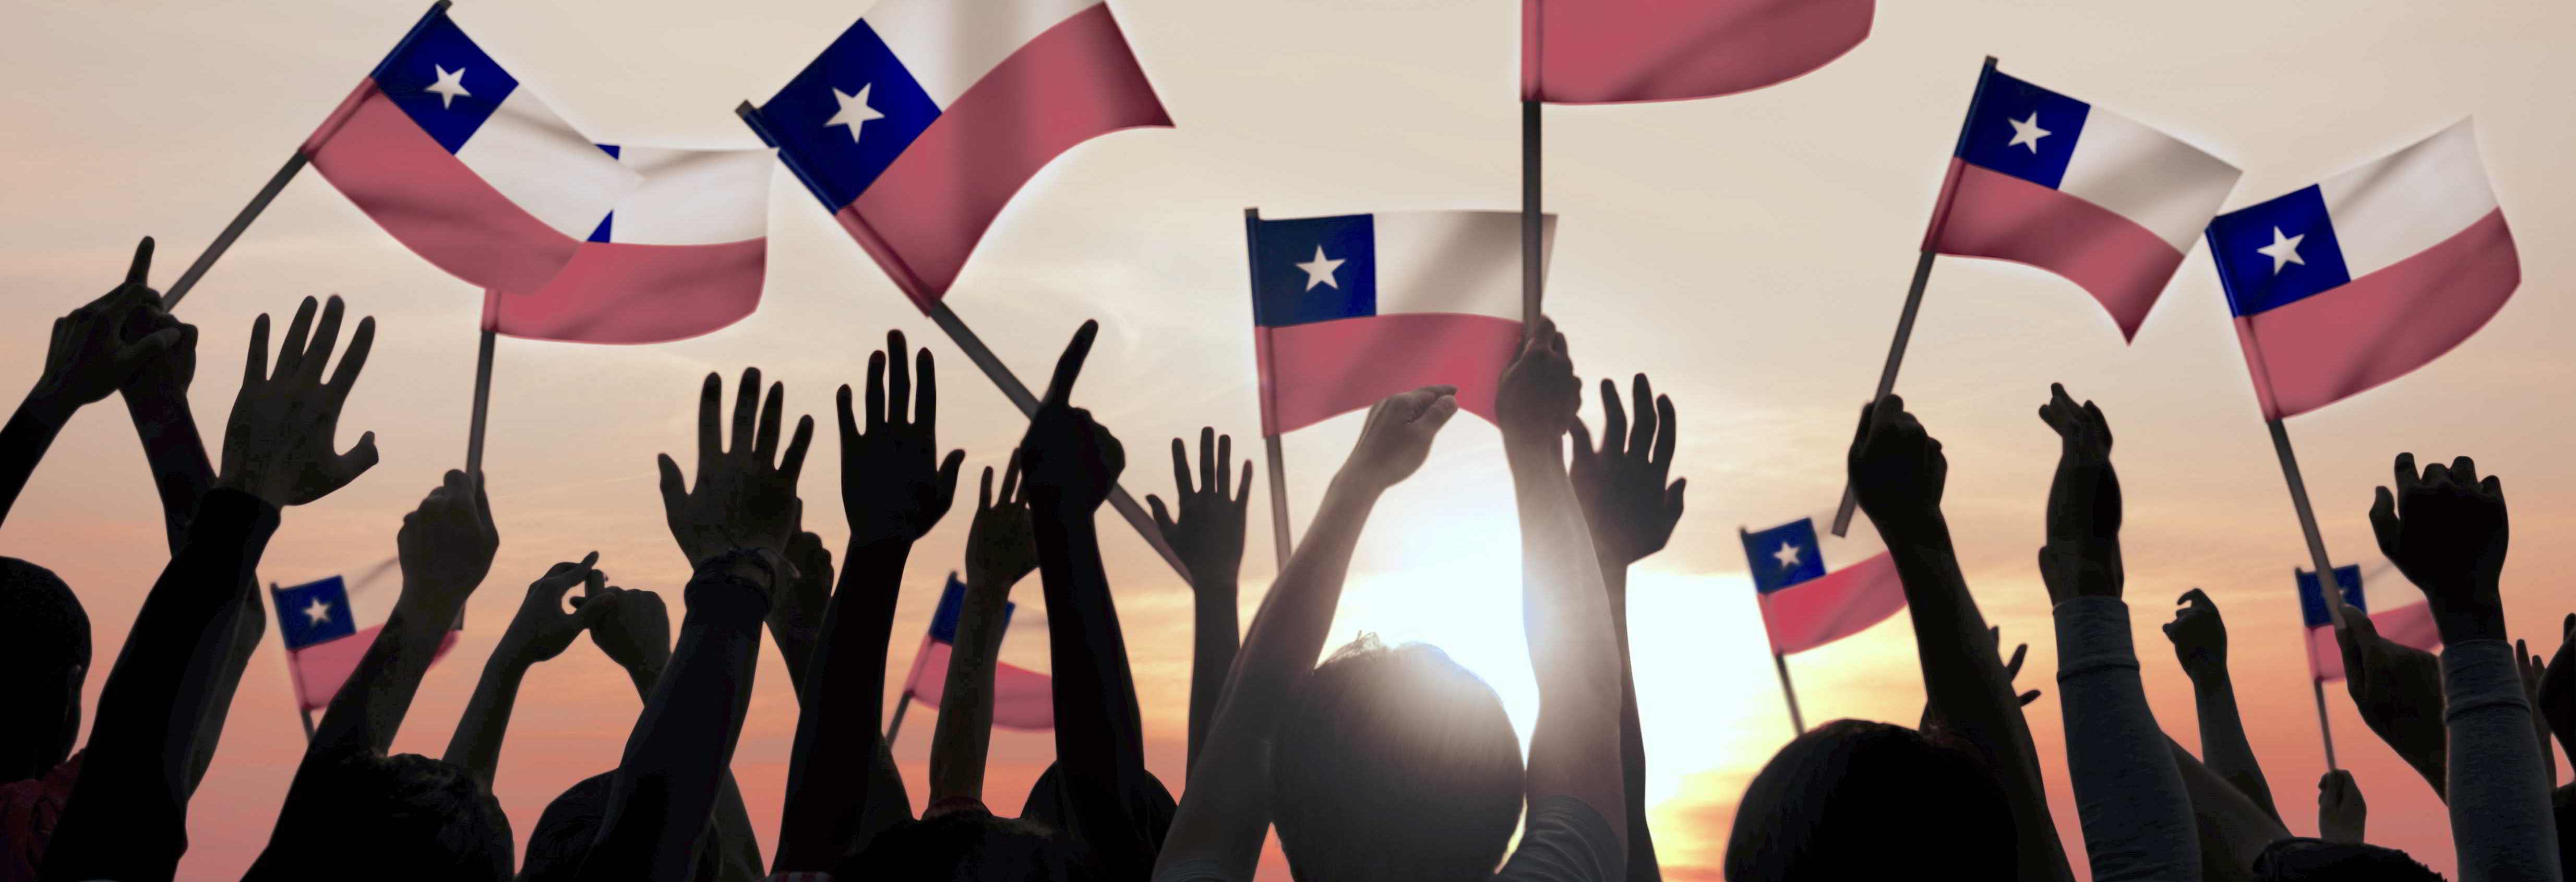 fiestas-patrias-chilenas-2016-banner2